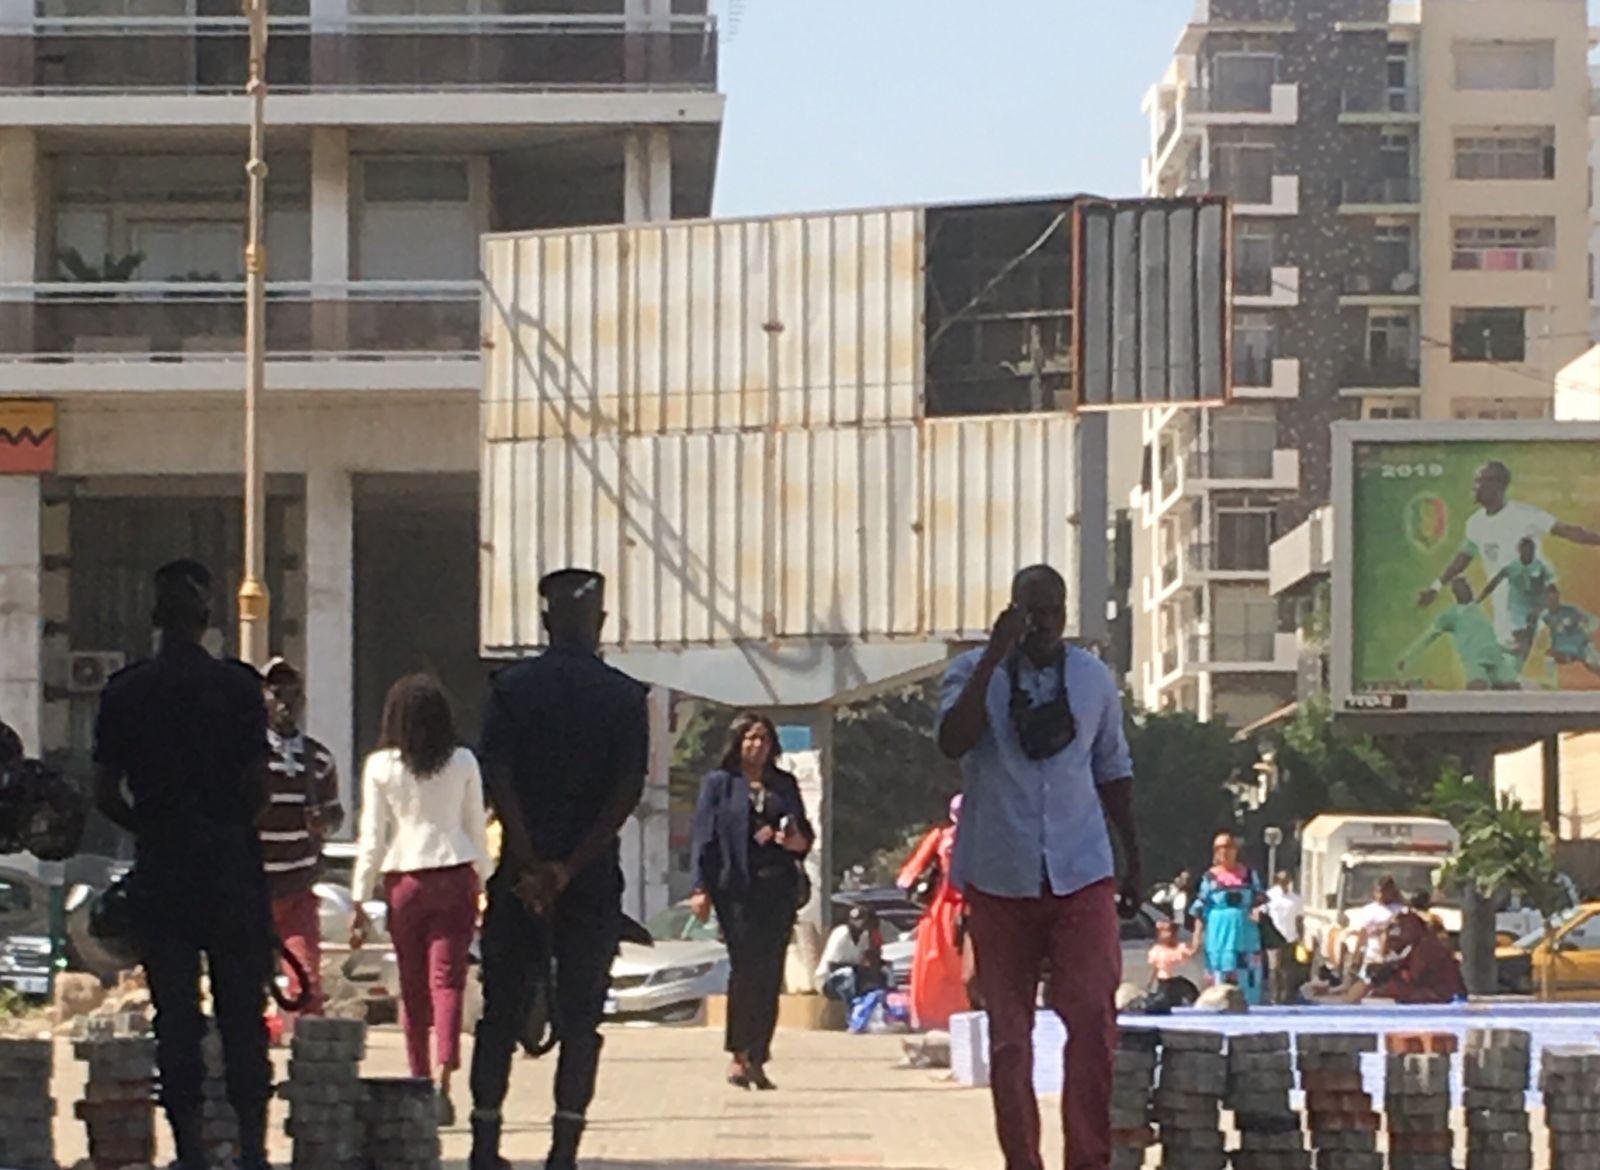 dakar securite 5 - Manifestations de « Ñoo Lank » : Dakar sous haute surveillance (Photos)